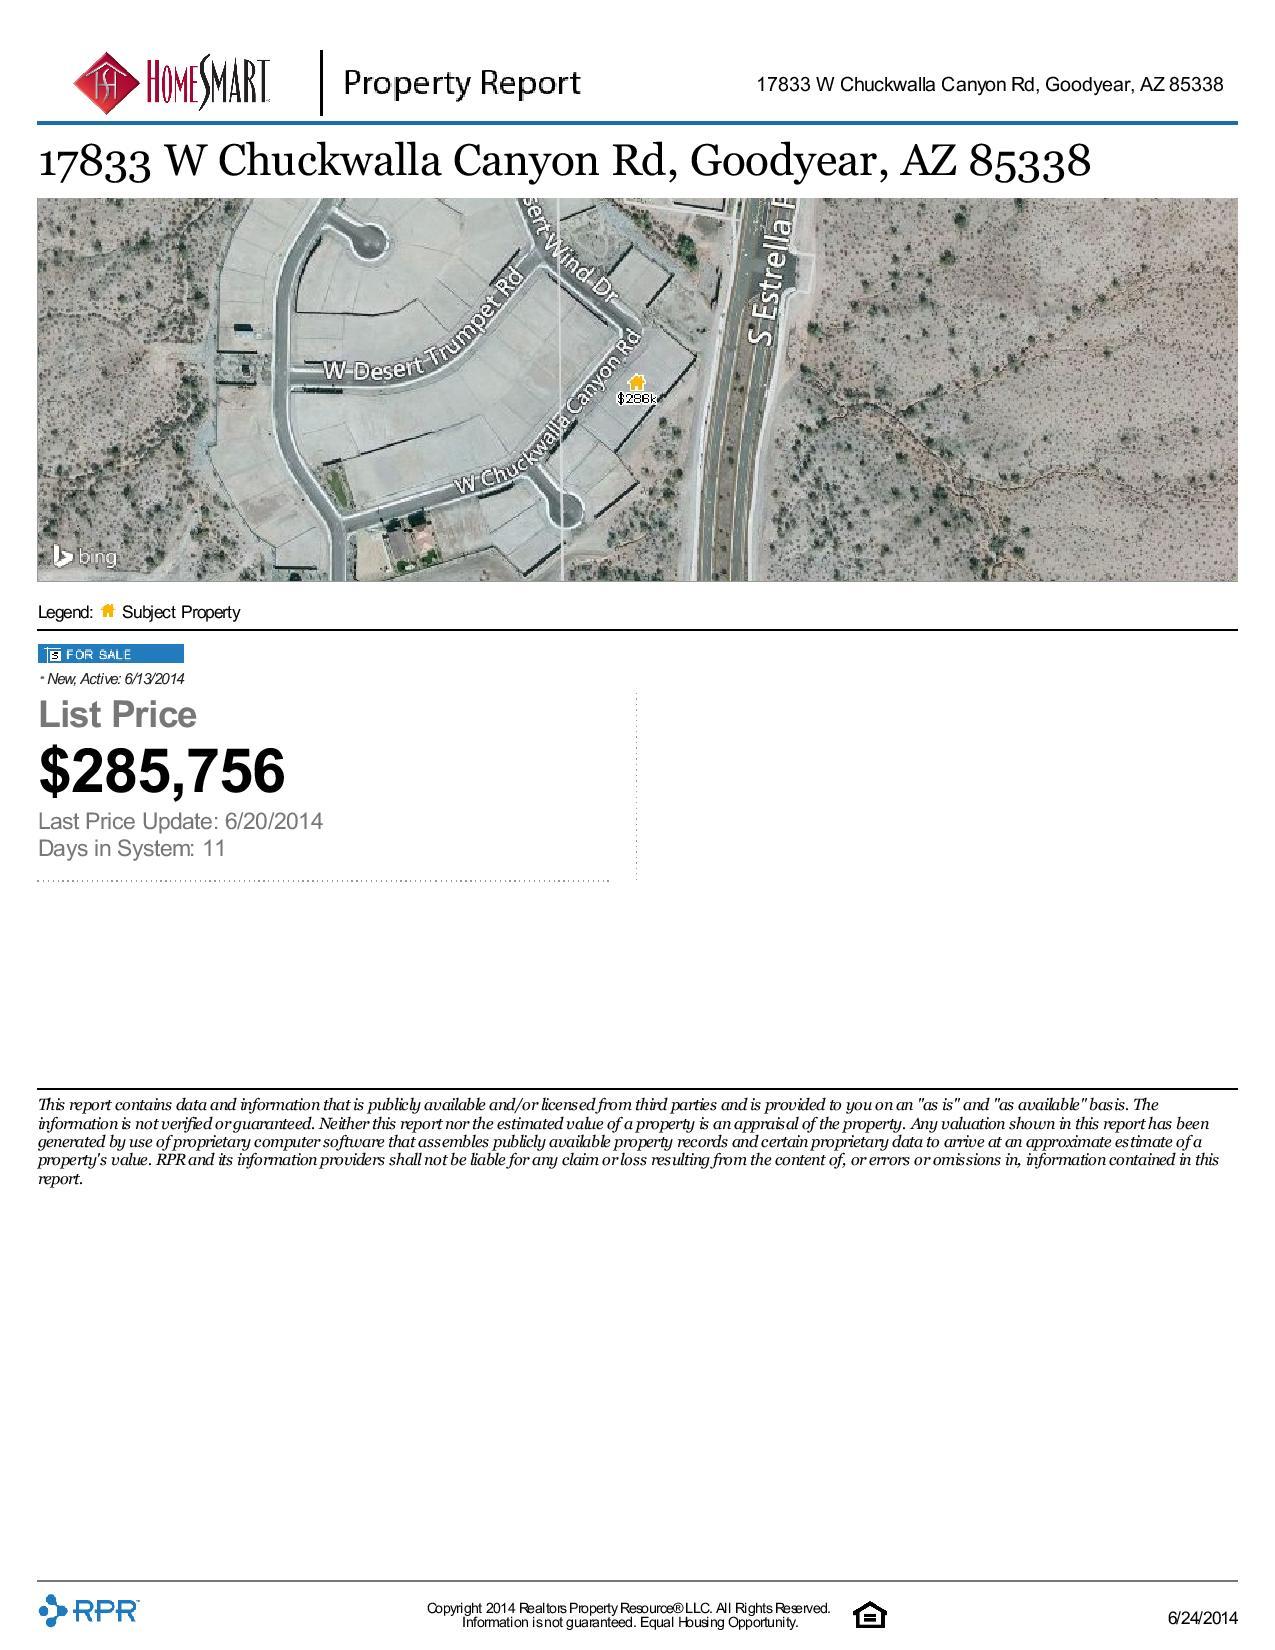 17833-W-Chuckwalla-Canyon-Rd-Goodyear-AZ-85338-page-002